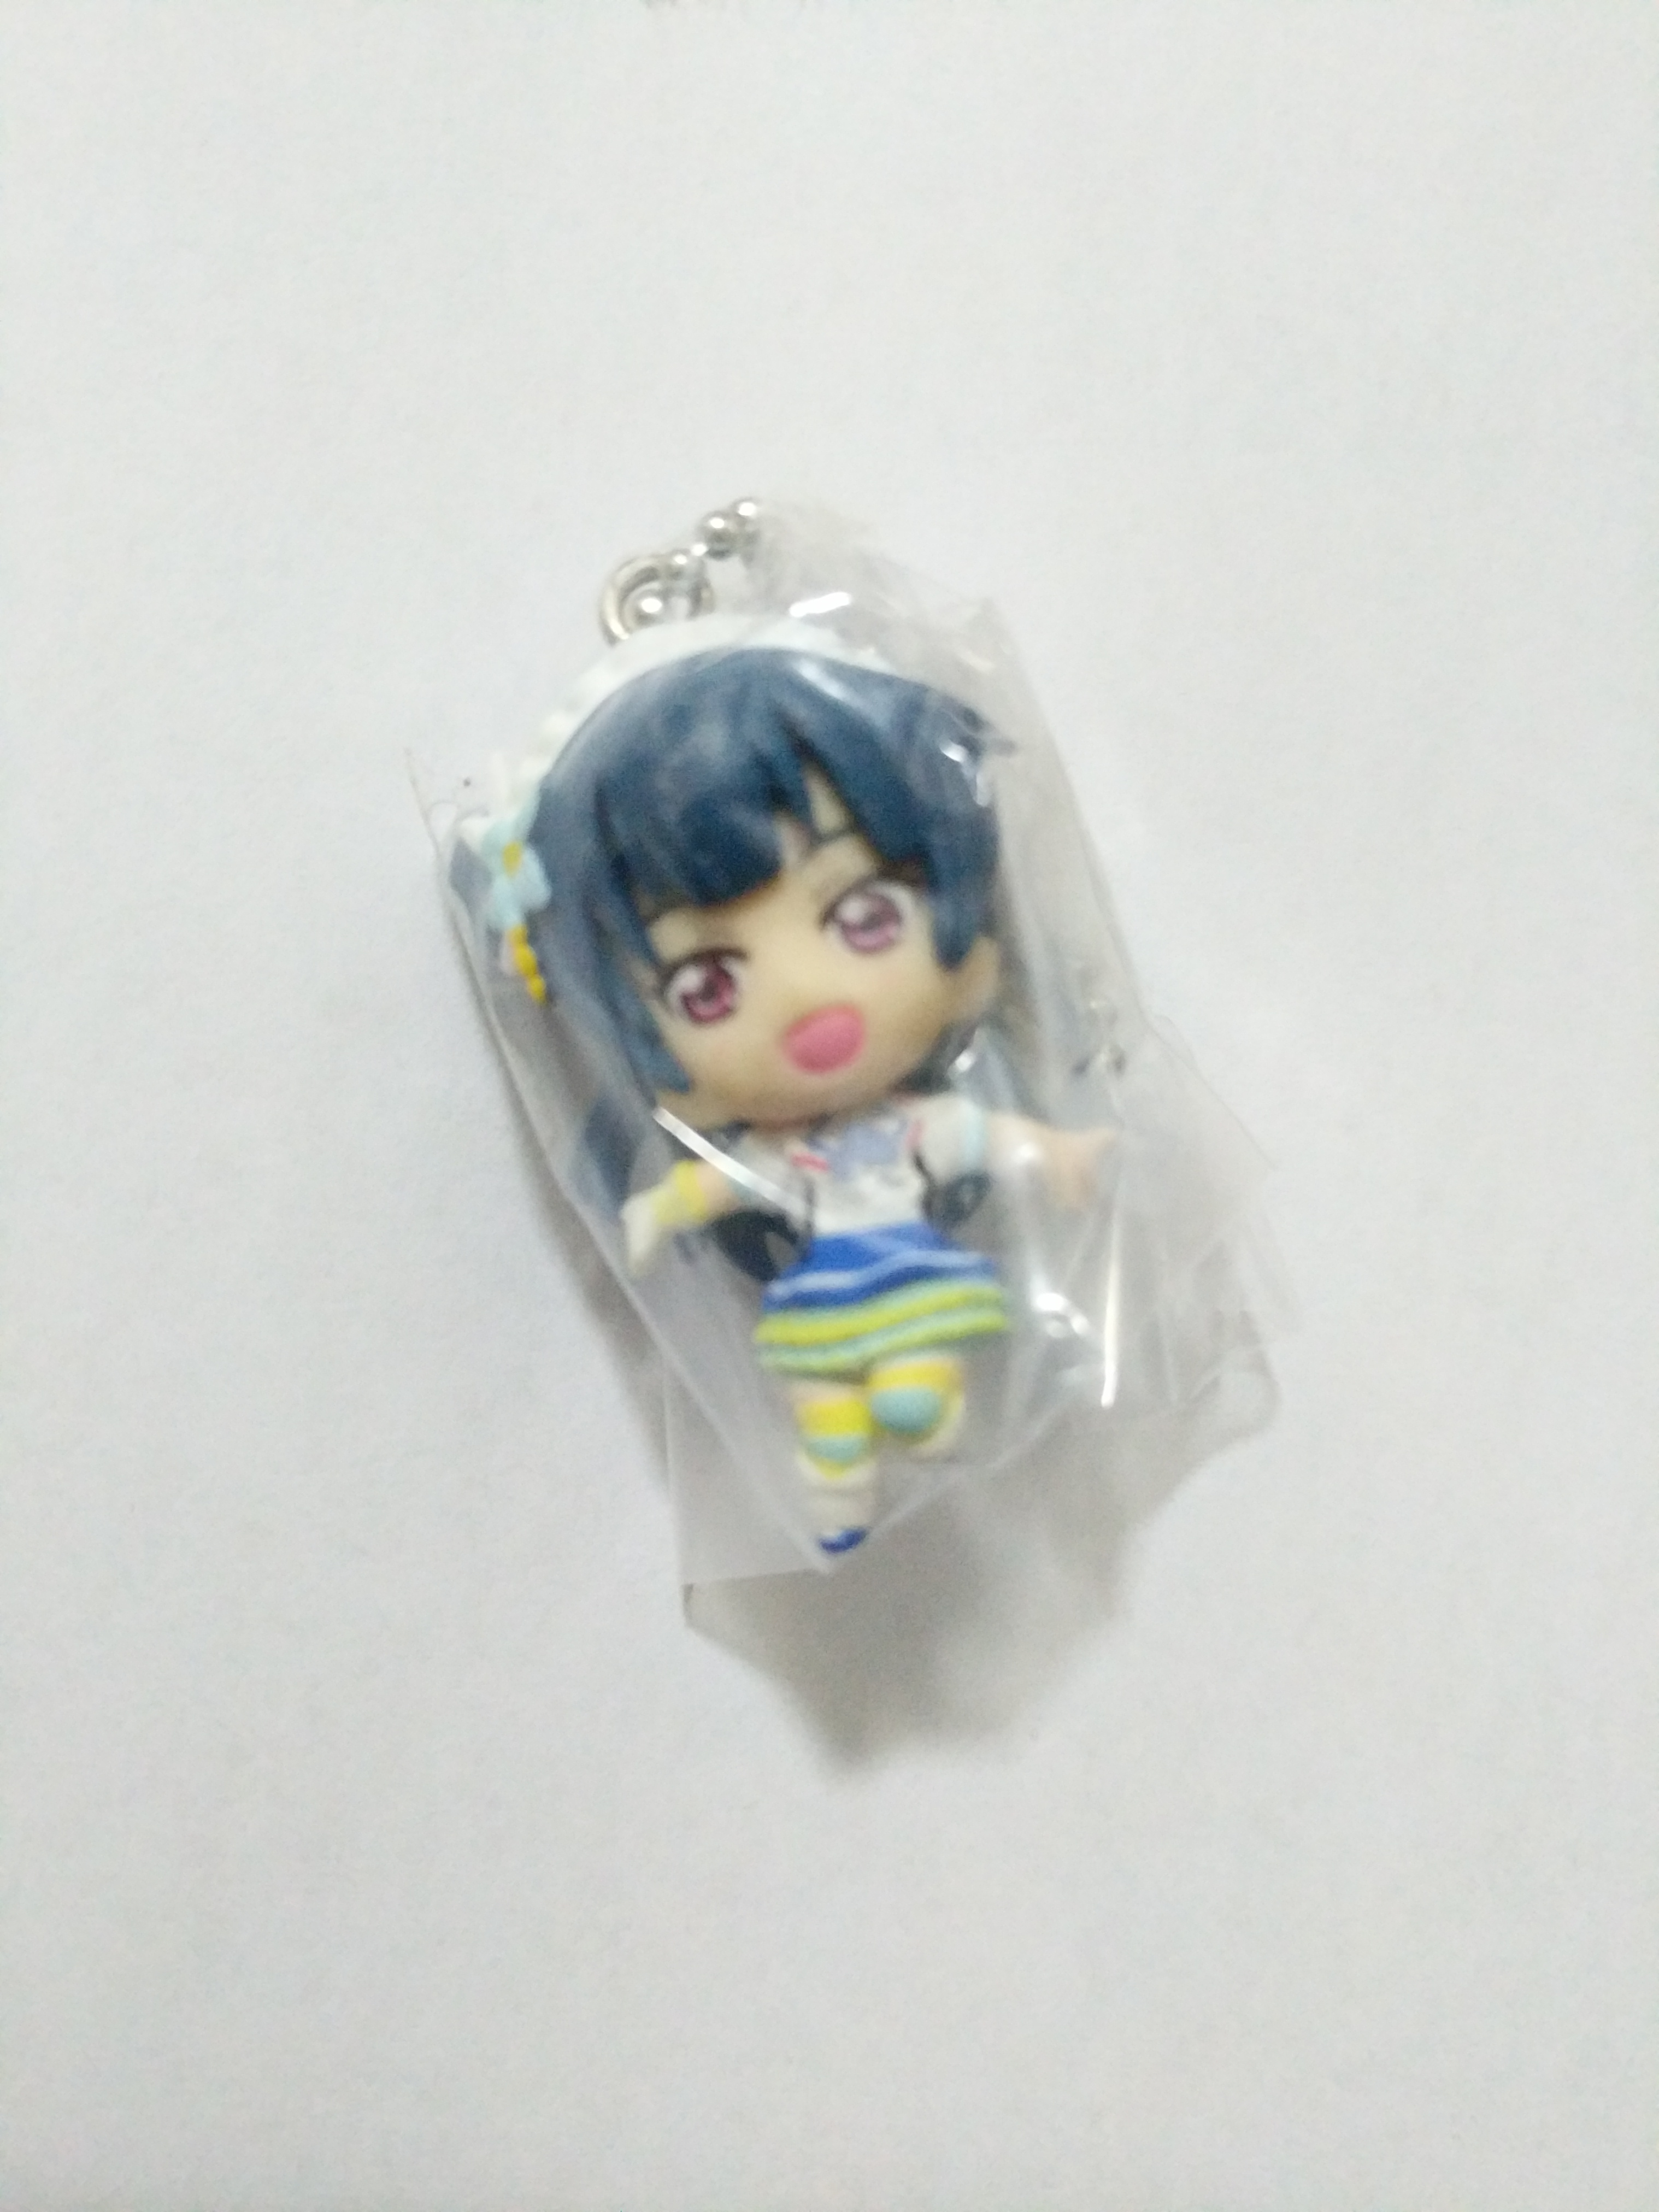 Yohane Aozora Jumping Heart mini figure strap